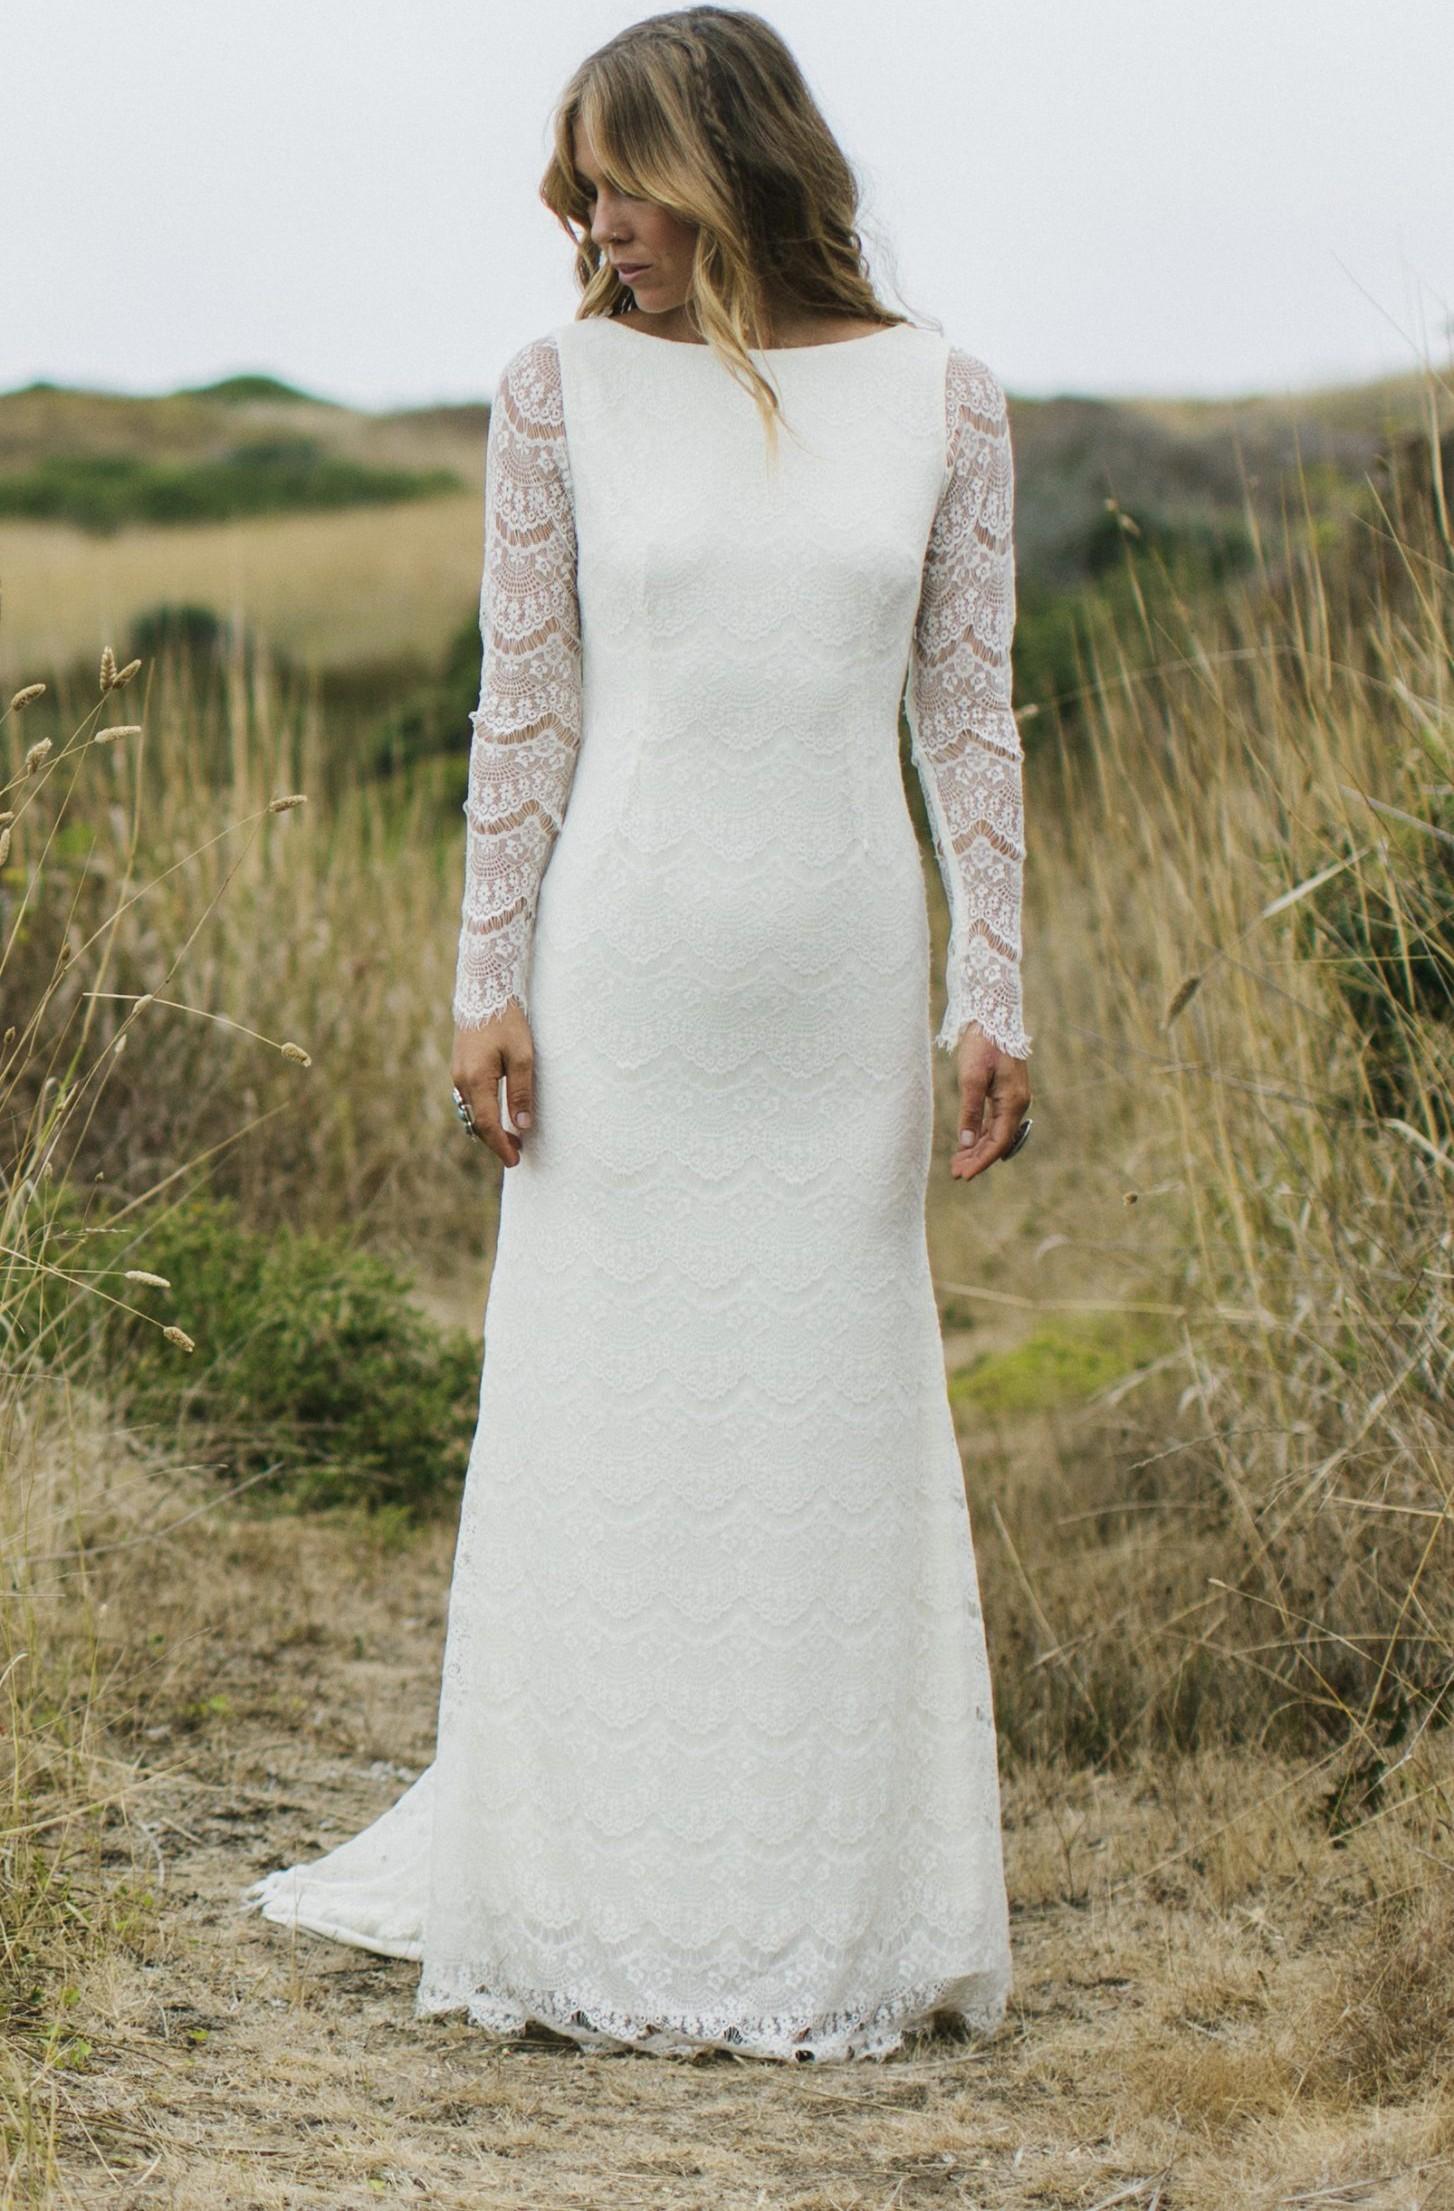 Daughters of simone tessa sample wedding dress on sale 47 off for Wedding dress sample sale san francisco